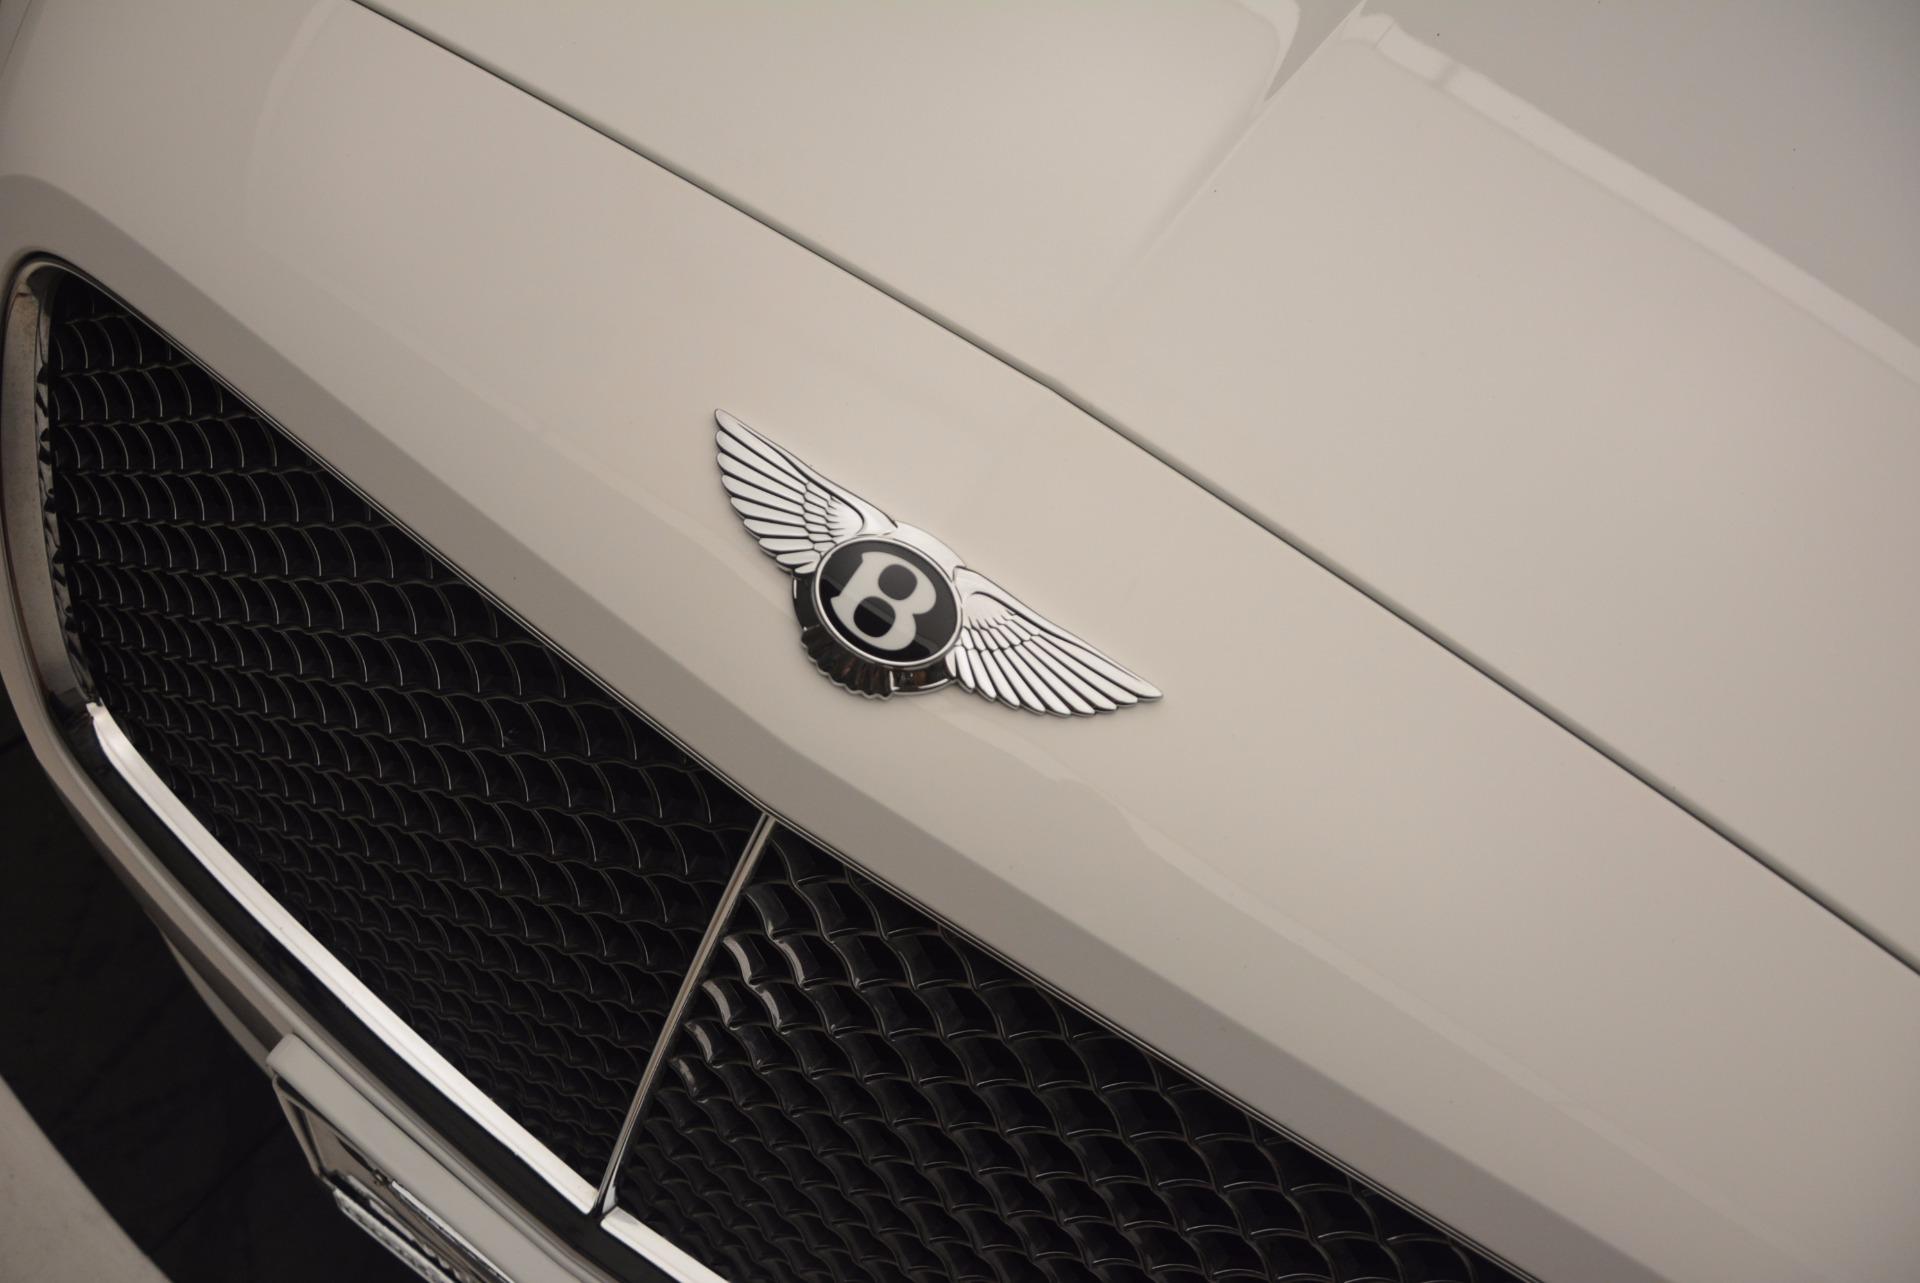 Used 2014 Bentley Continental GT Speed For Sale In Westport, CT 1102_p16